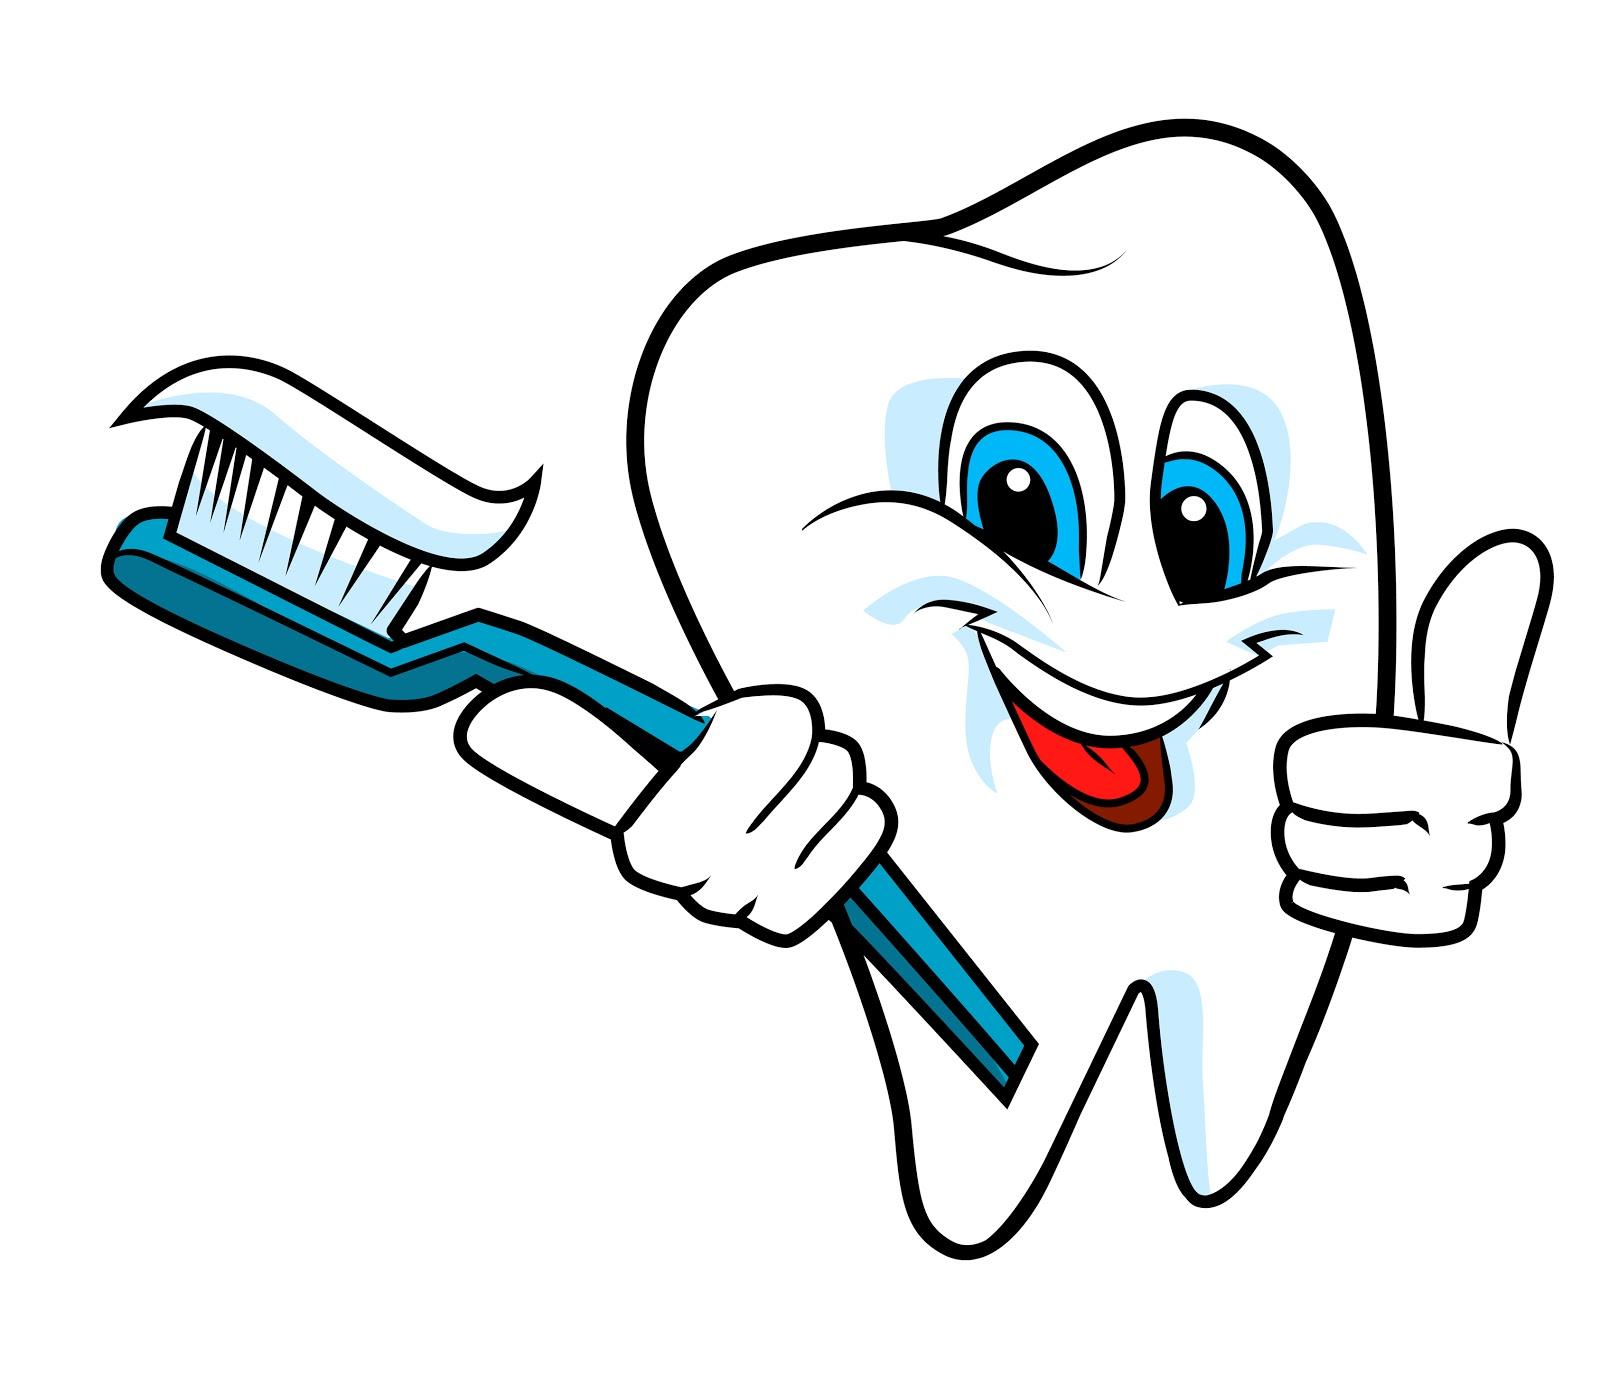 Clip Art Brushing Teeth Clipart clean teeth clipart kid linguistics research digest teef or teeth